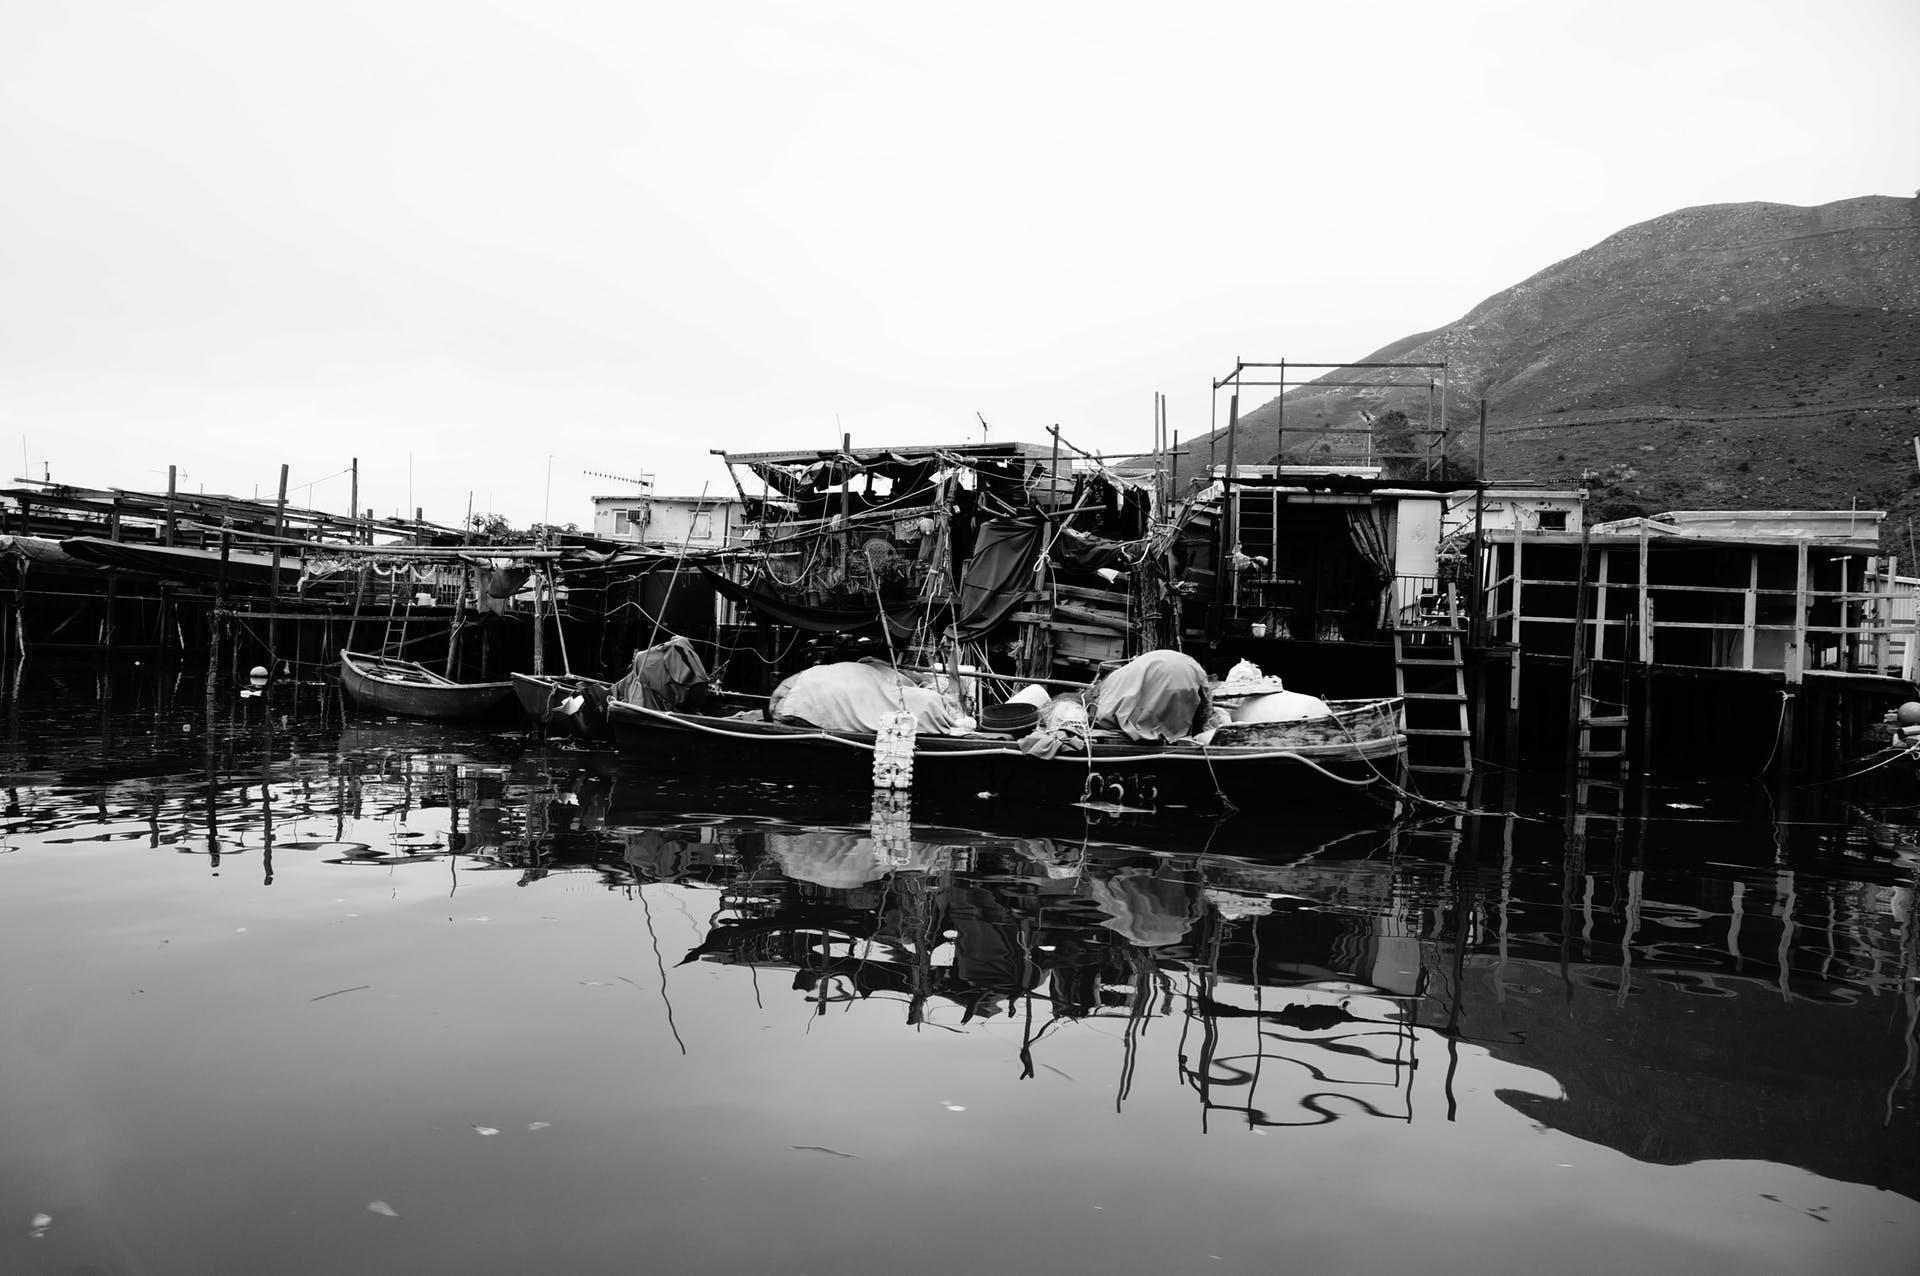 fishing village boats free image village mountain black and white stilt houses free photo